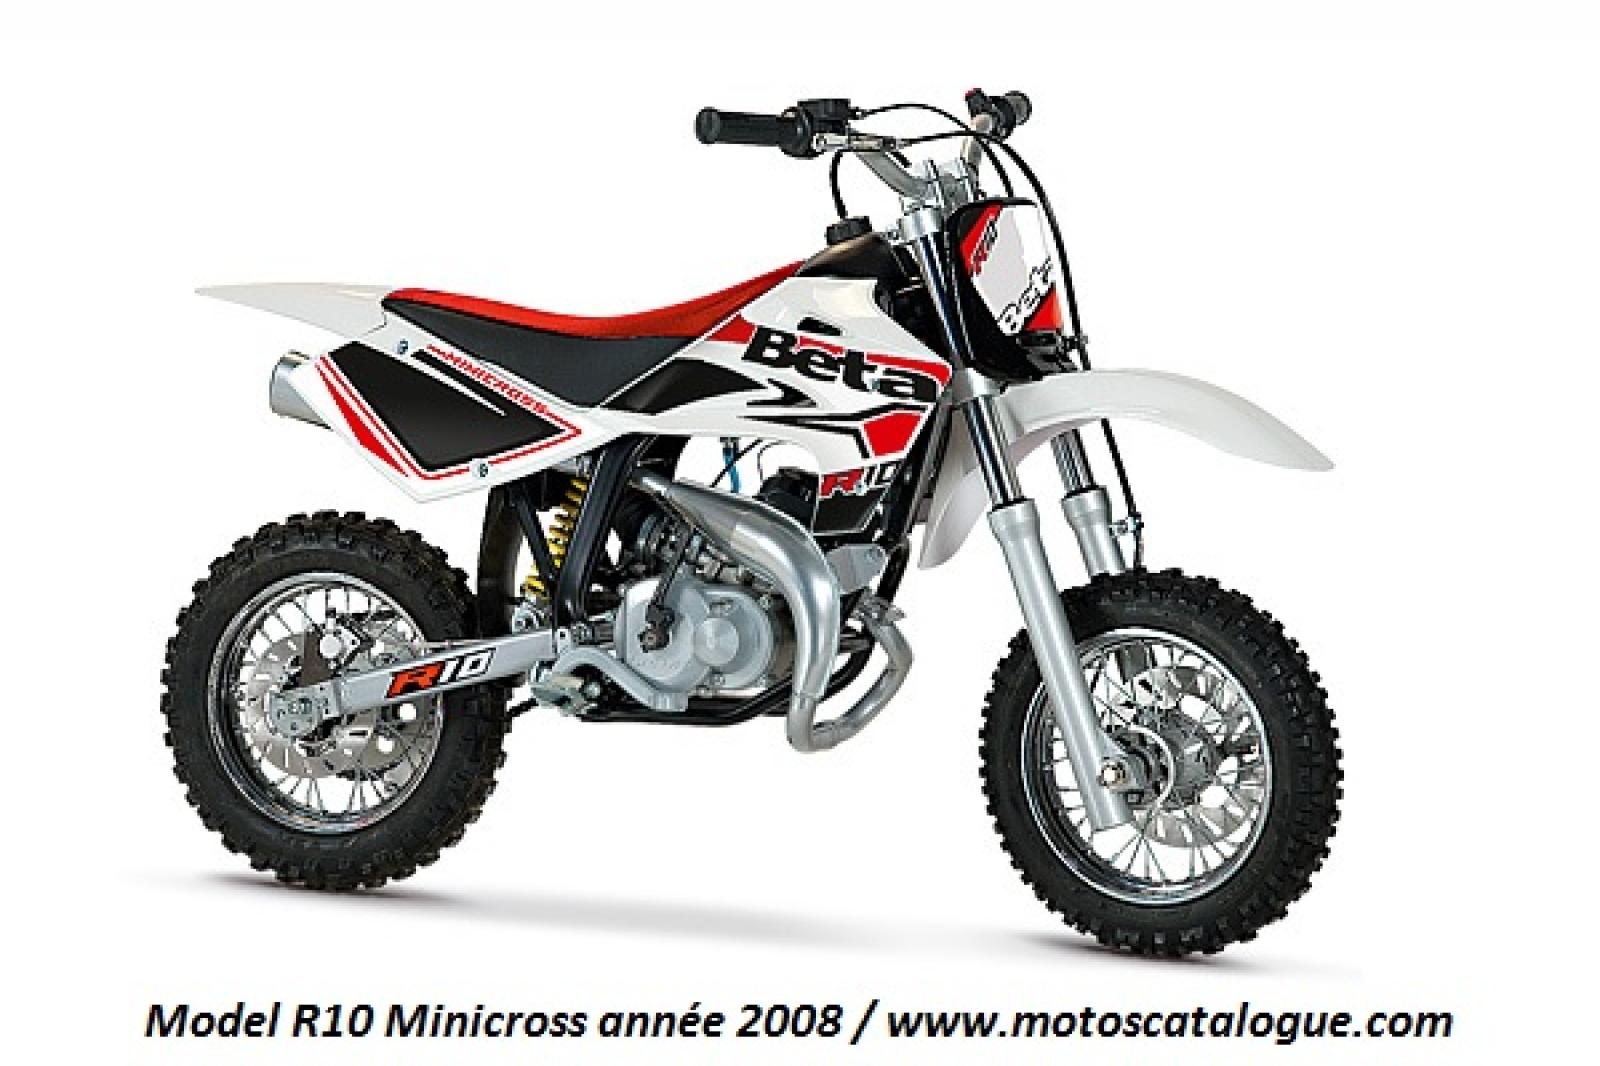 Beta Minimotard R 125